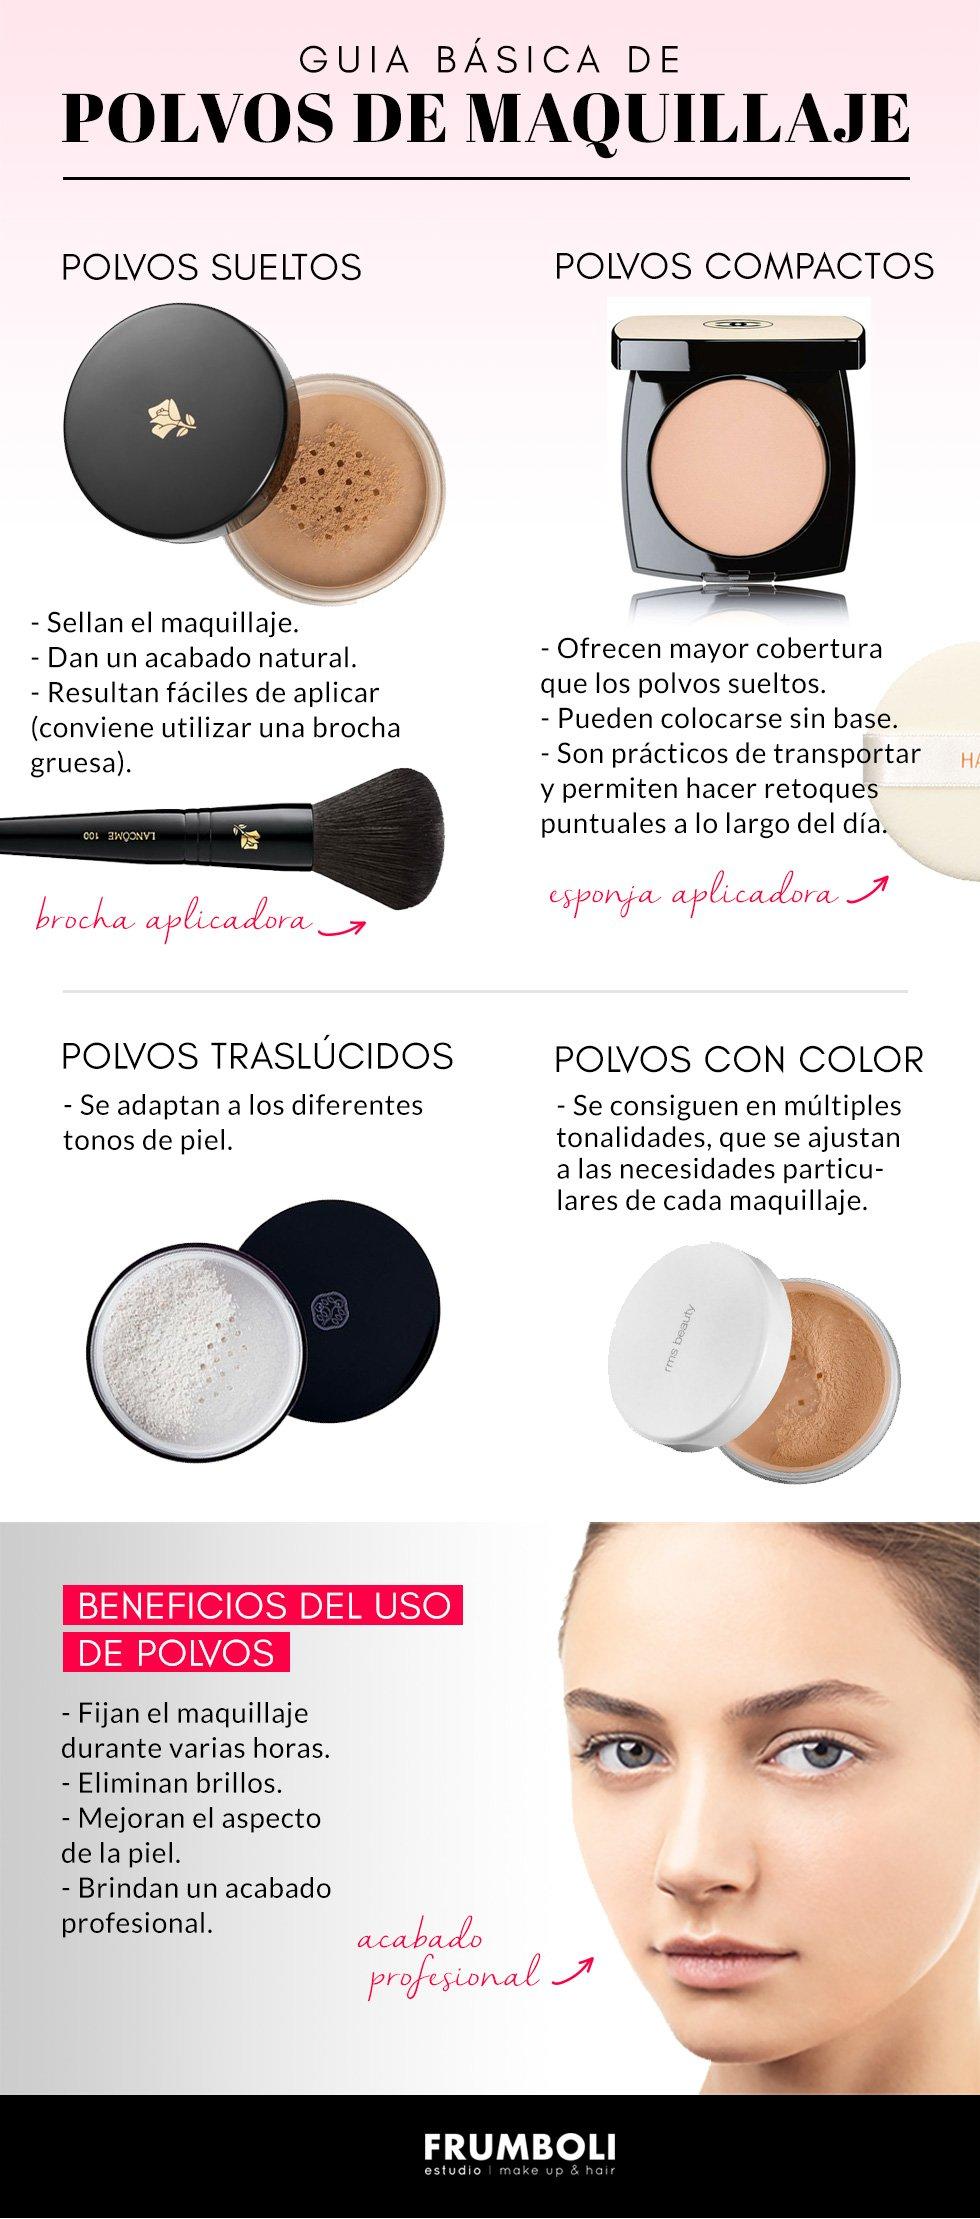 Guia Basica de polvos de maquillaje